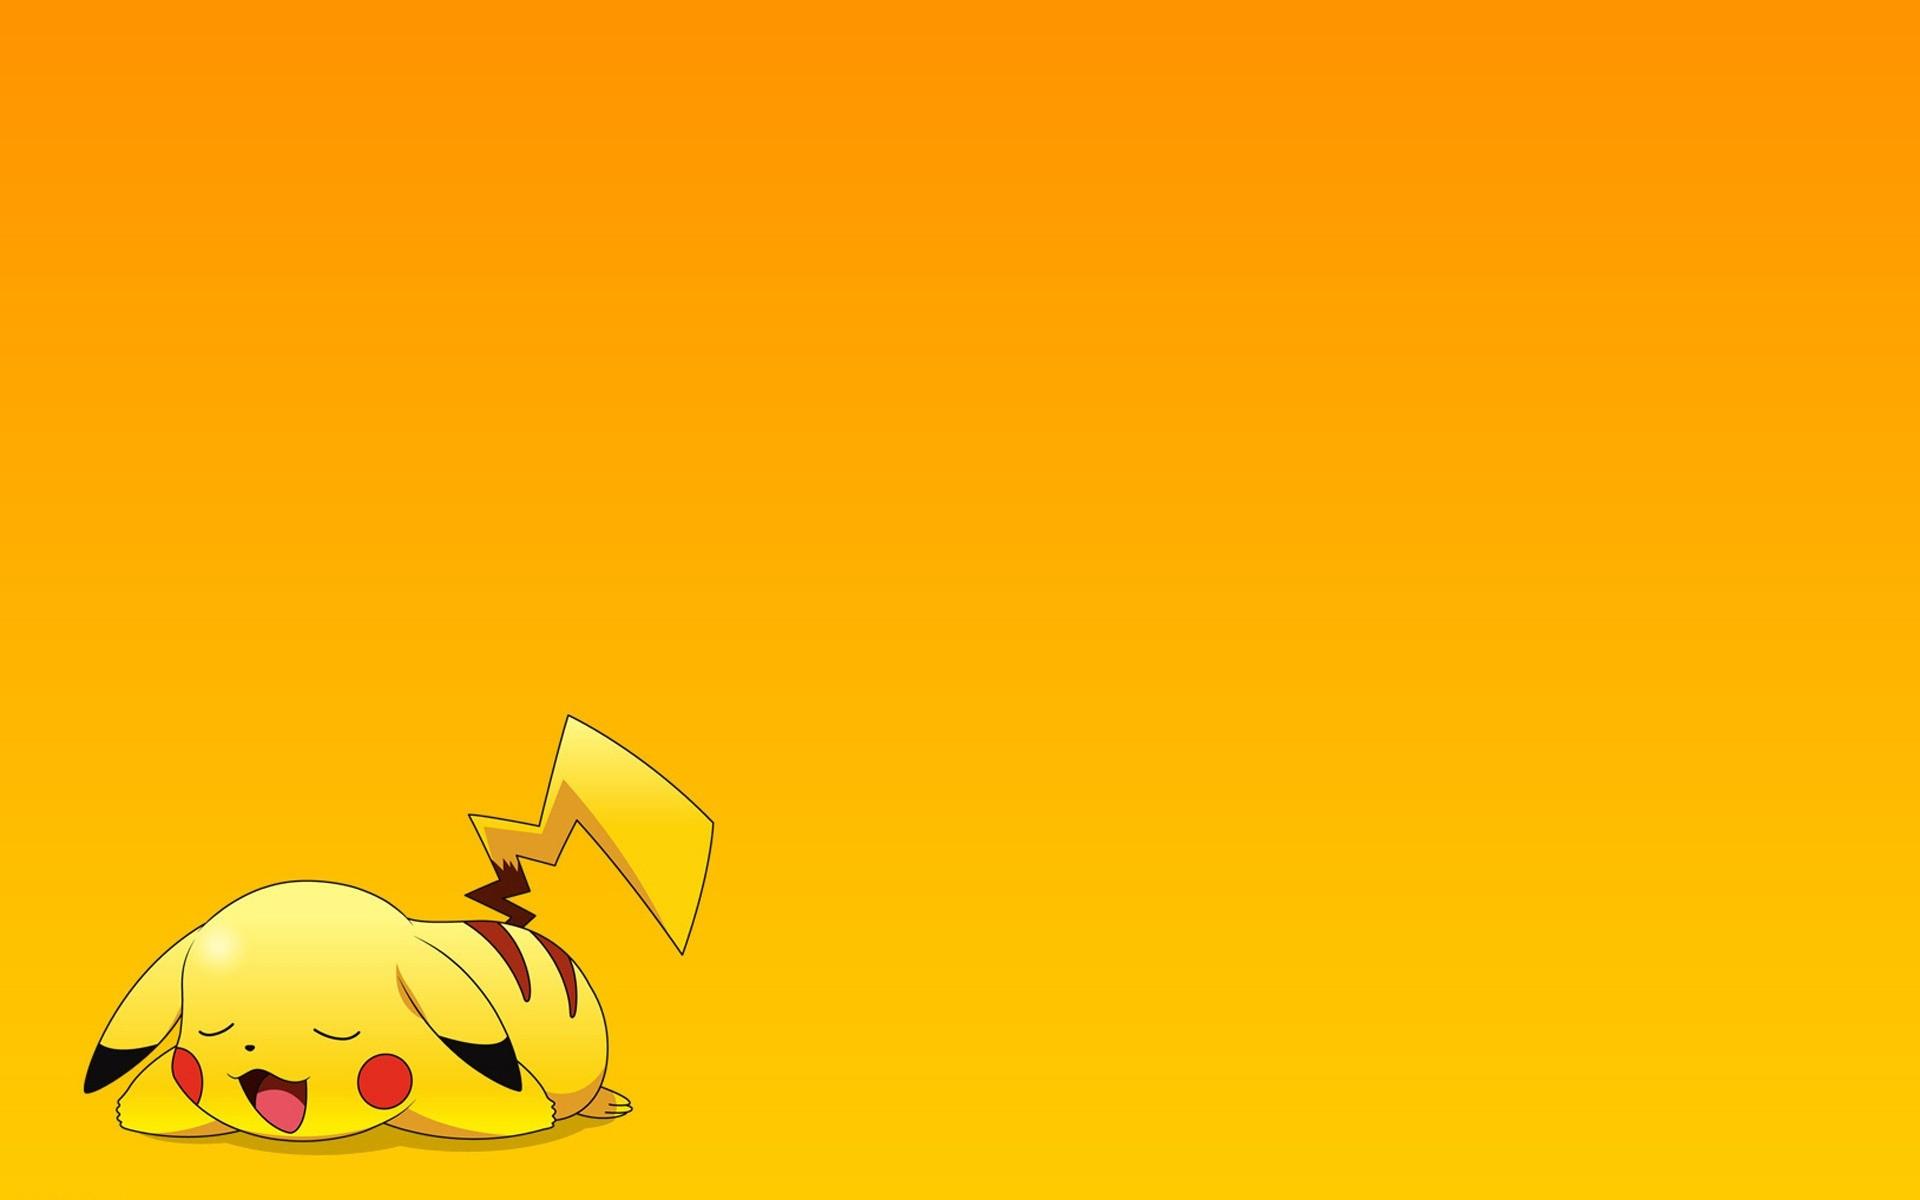 Покемон Пикачу бесплатно